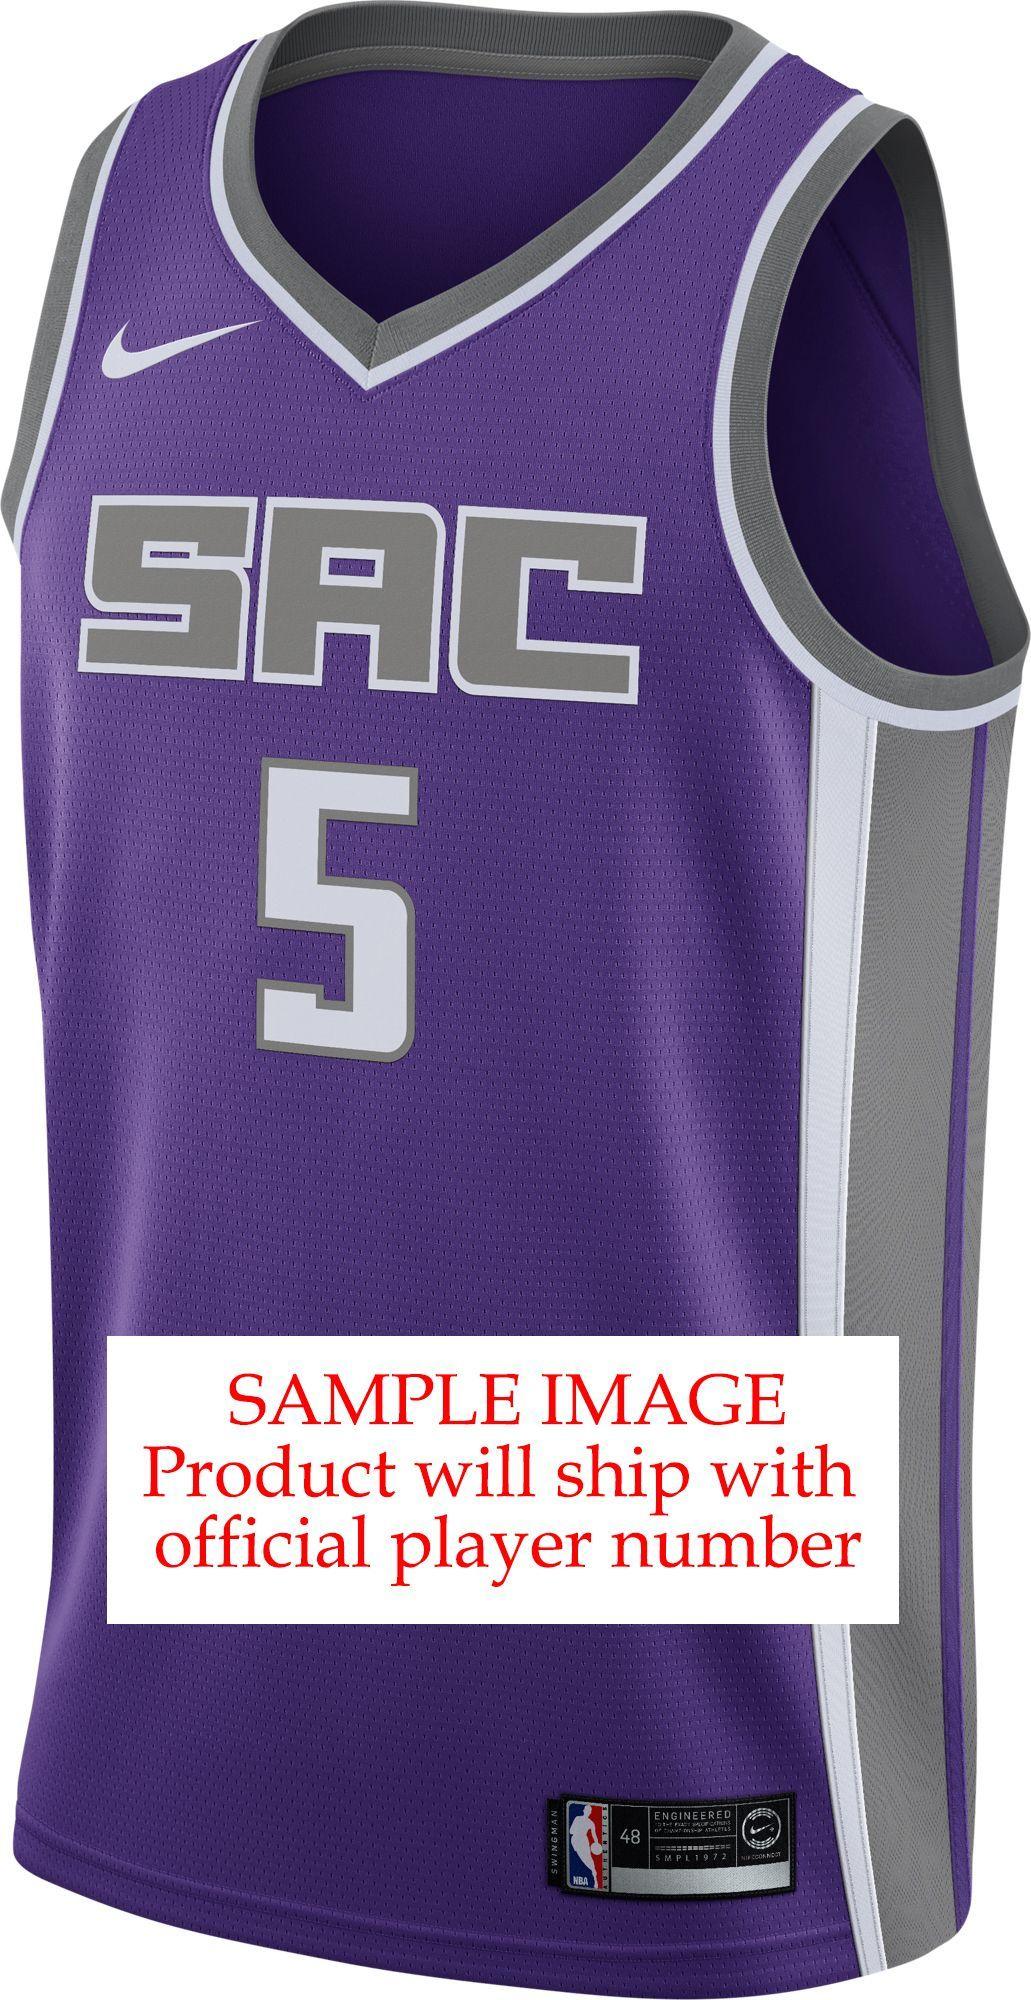 size 40 4ff1c 64561 Nike Men's Sacramento Kings Marvin Bagley III #35 Purple Dri ...